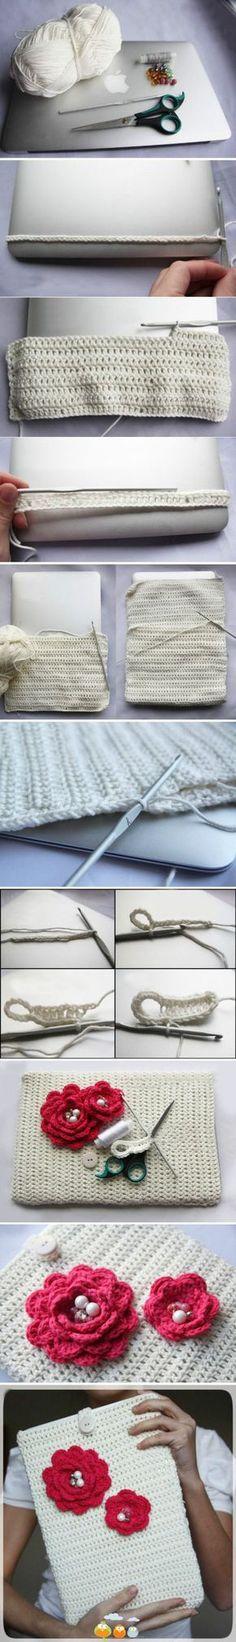 Crochet Cover Ipad - Photo Tutorial * ✿⊱╮Teresa Restegui http://www.pinterest.com/teretegui/✿⊱╮